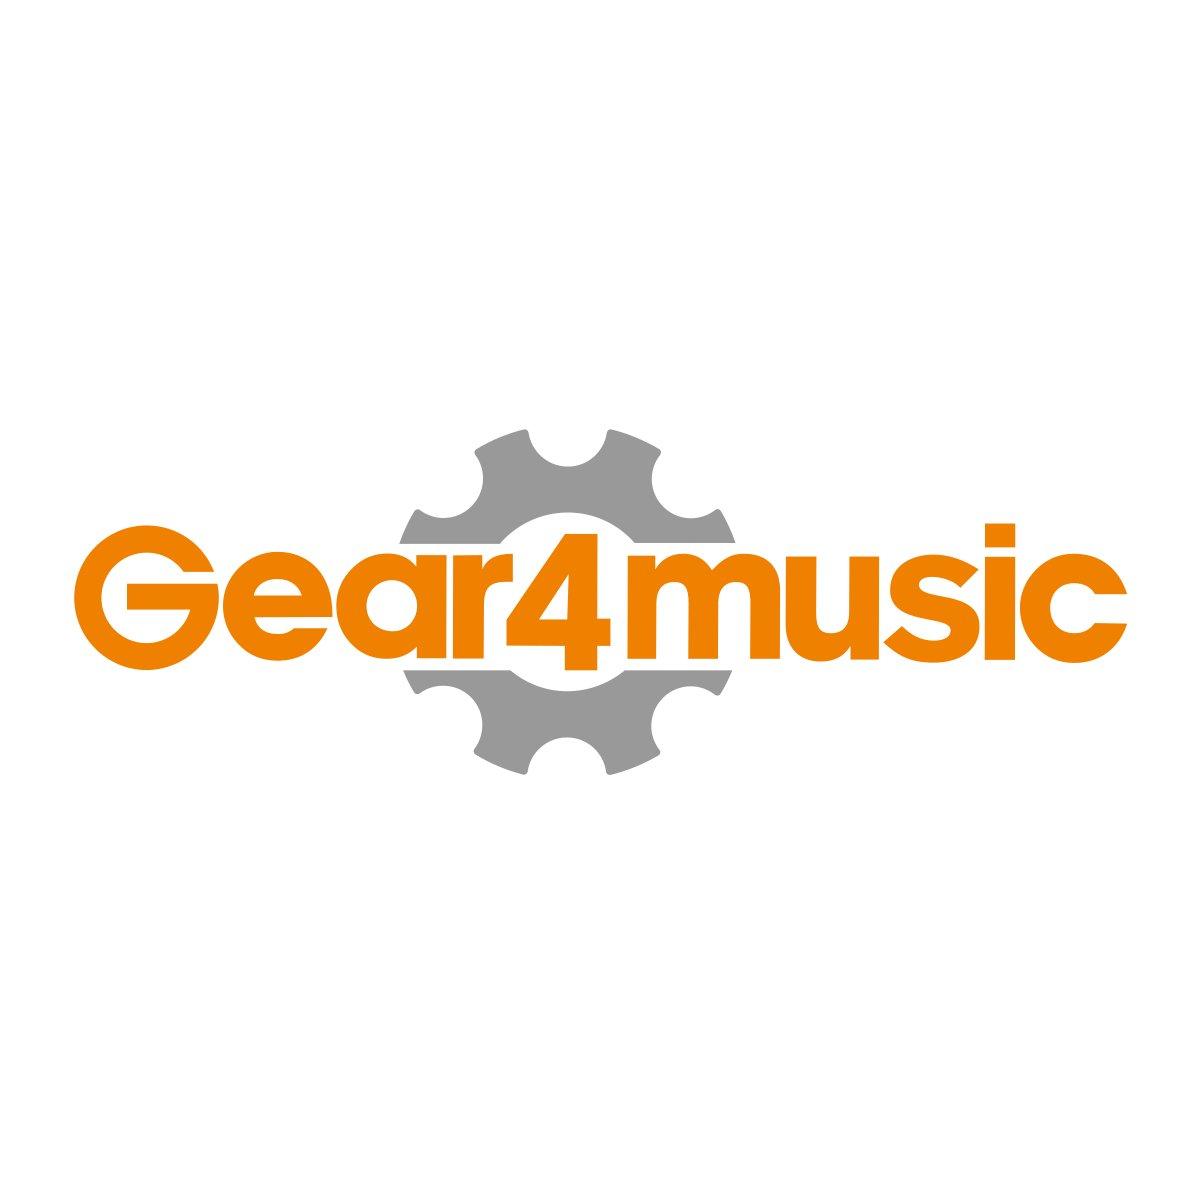 vox amplug 2 guitar headphone amp metal at gear4music. Black Bedroom Furniture Sets. Home Design Ideas